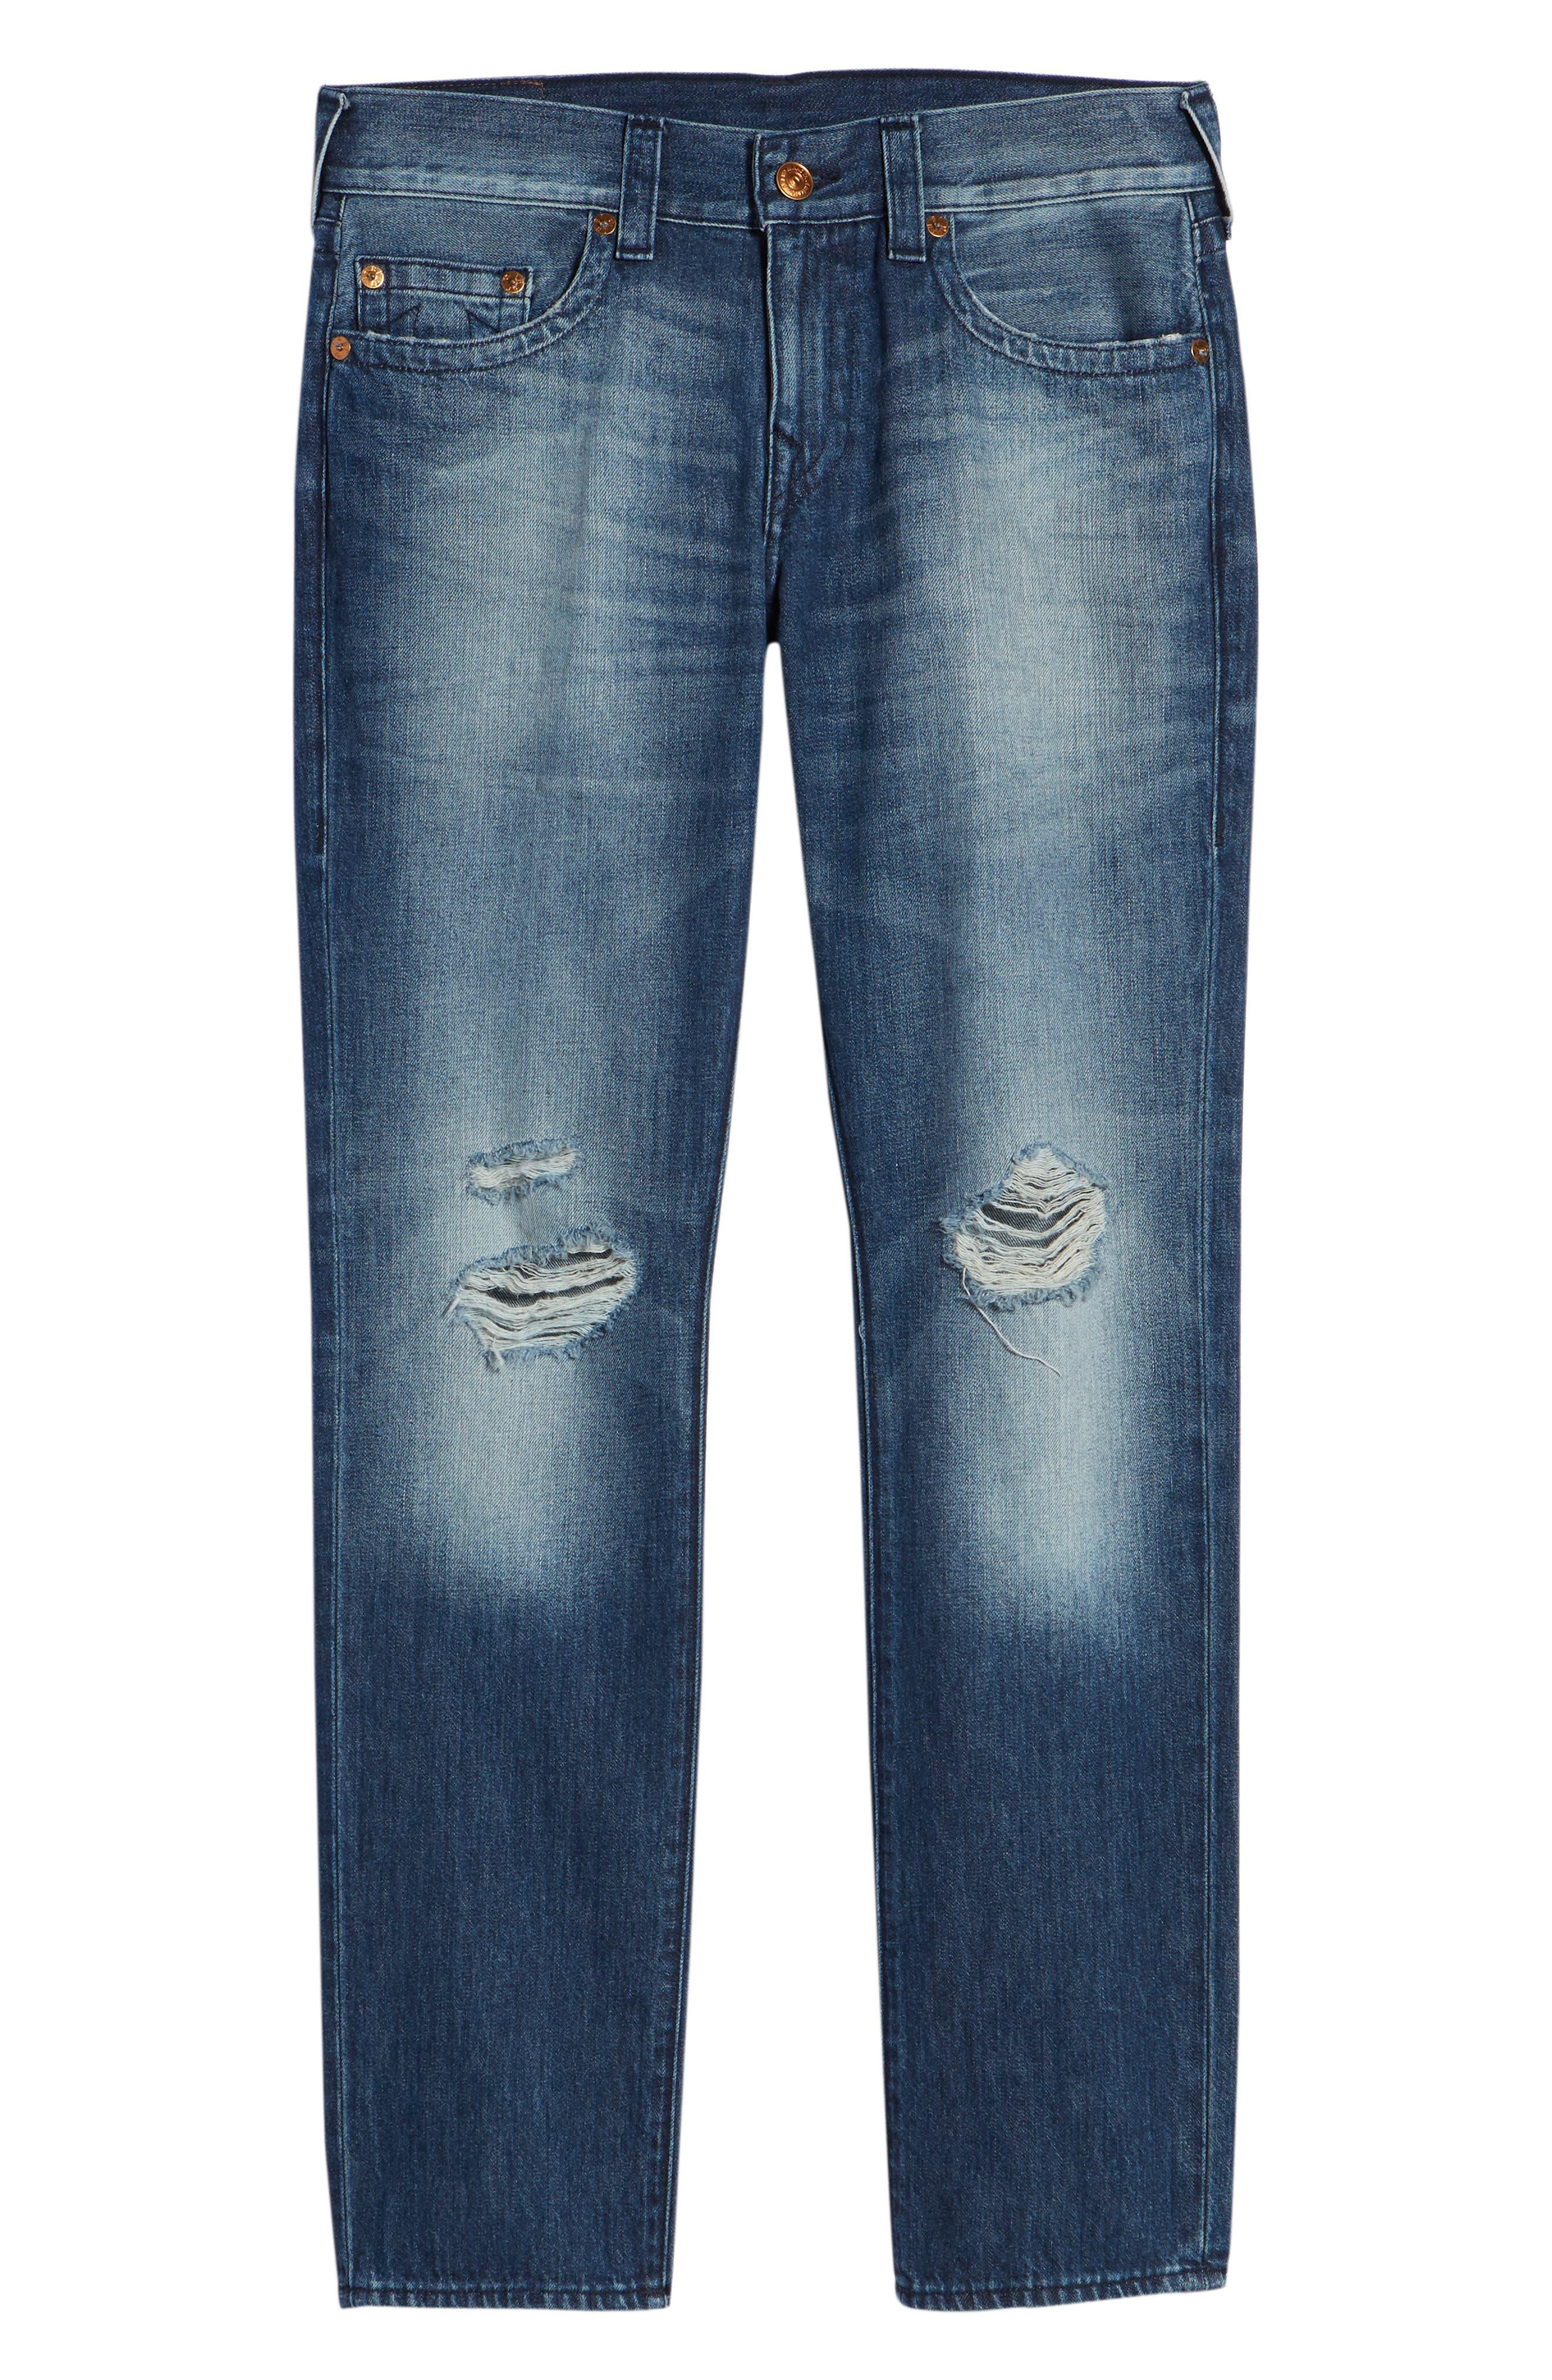 Geno Straight Leg Jeans,                             Alternate thumbnail 6, color,                             WORN SUSPECT